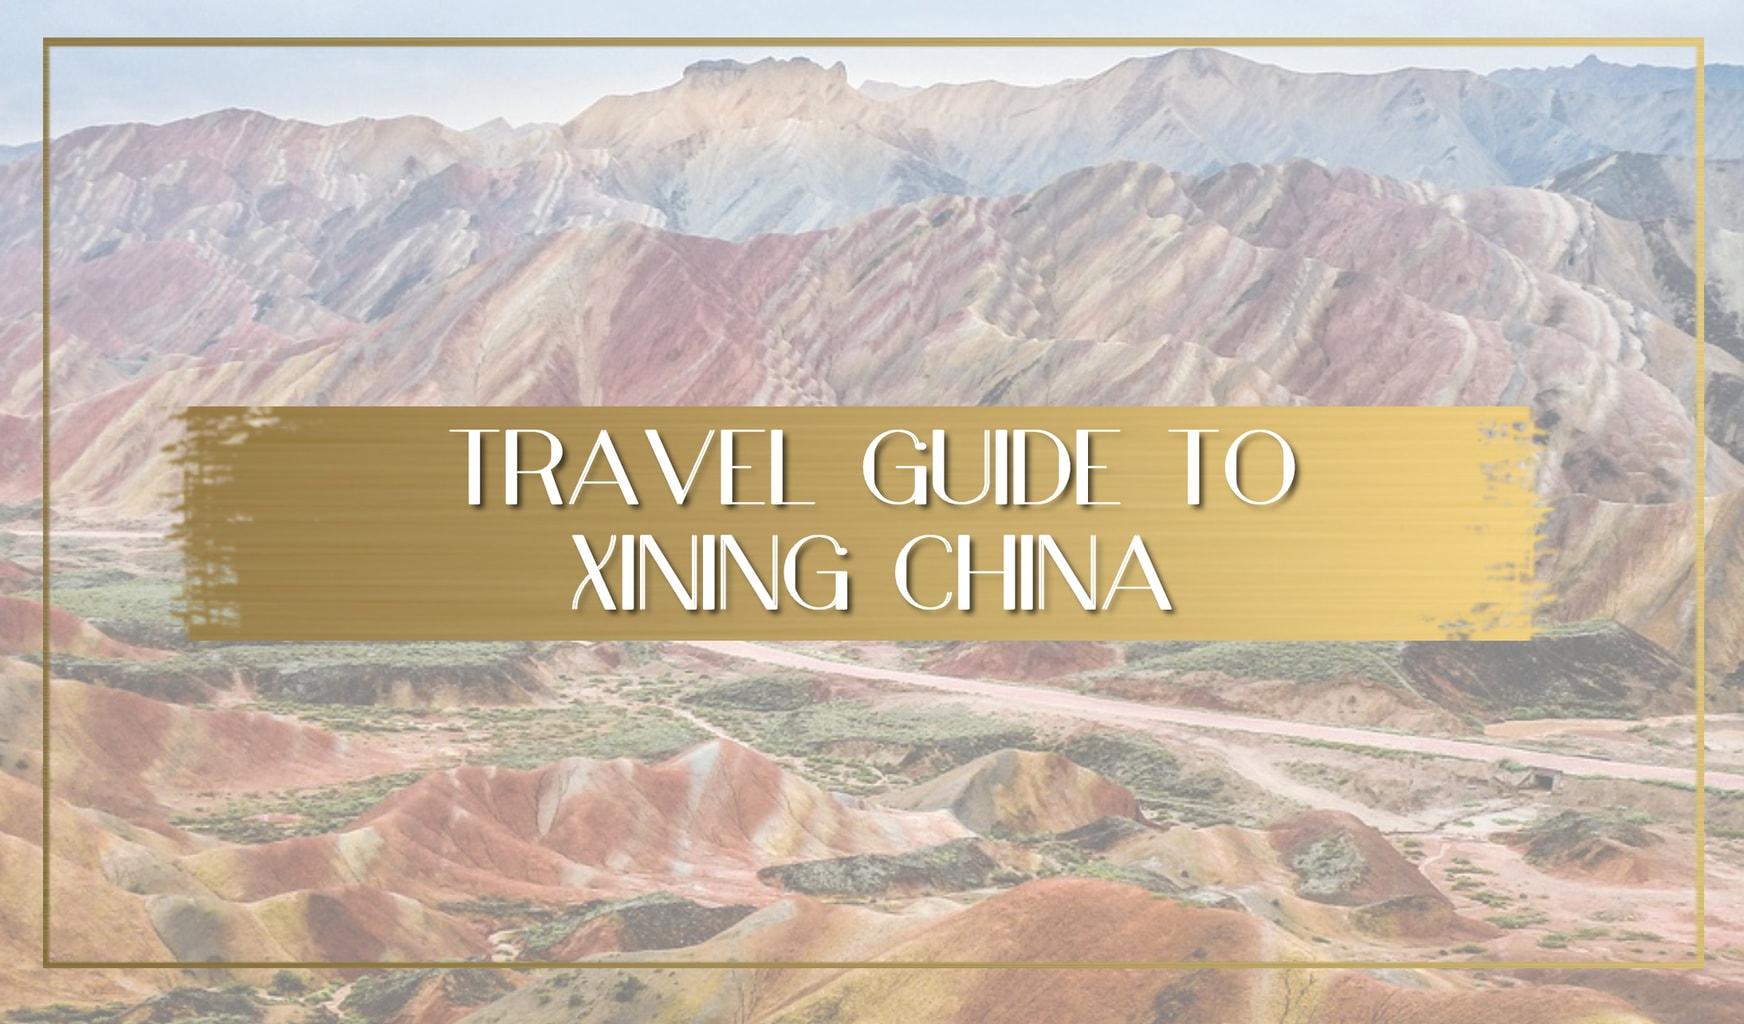 Travel guide to Xining China main